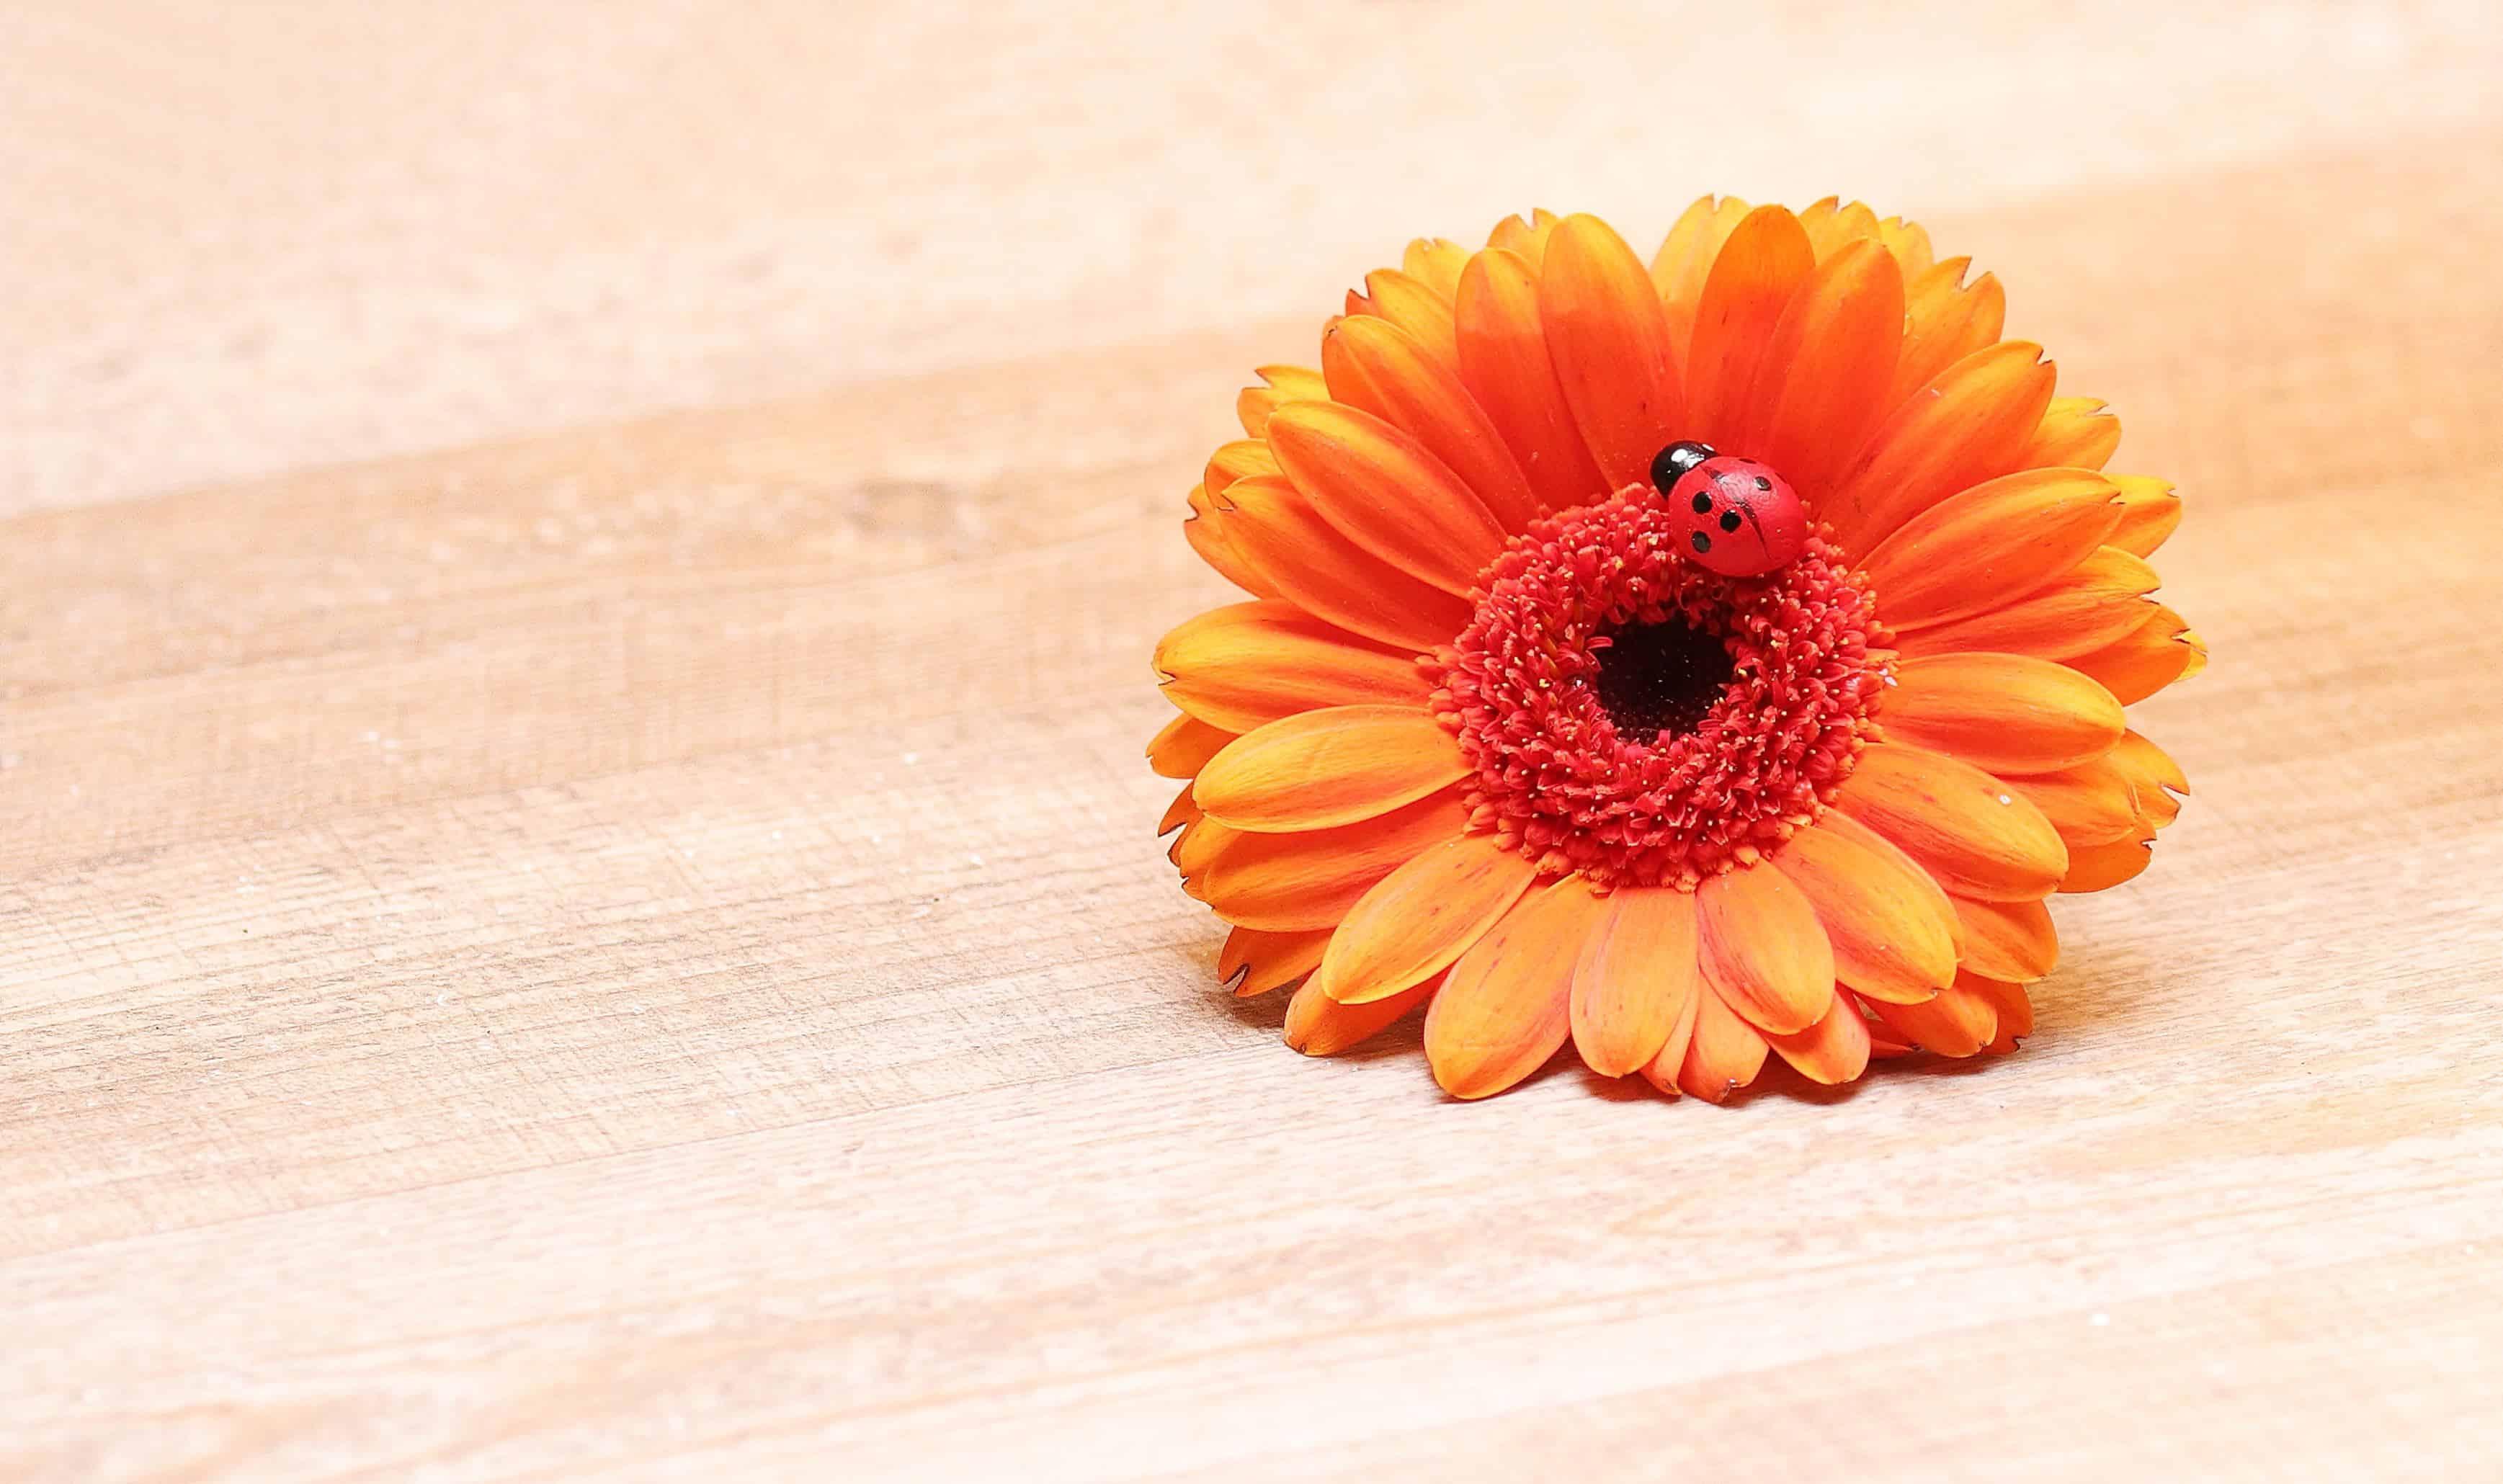 Free picture: still life, decoration, orange color, nature, summer ...